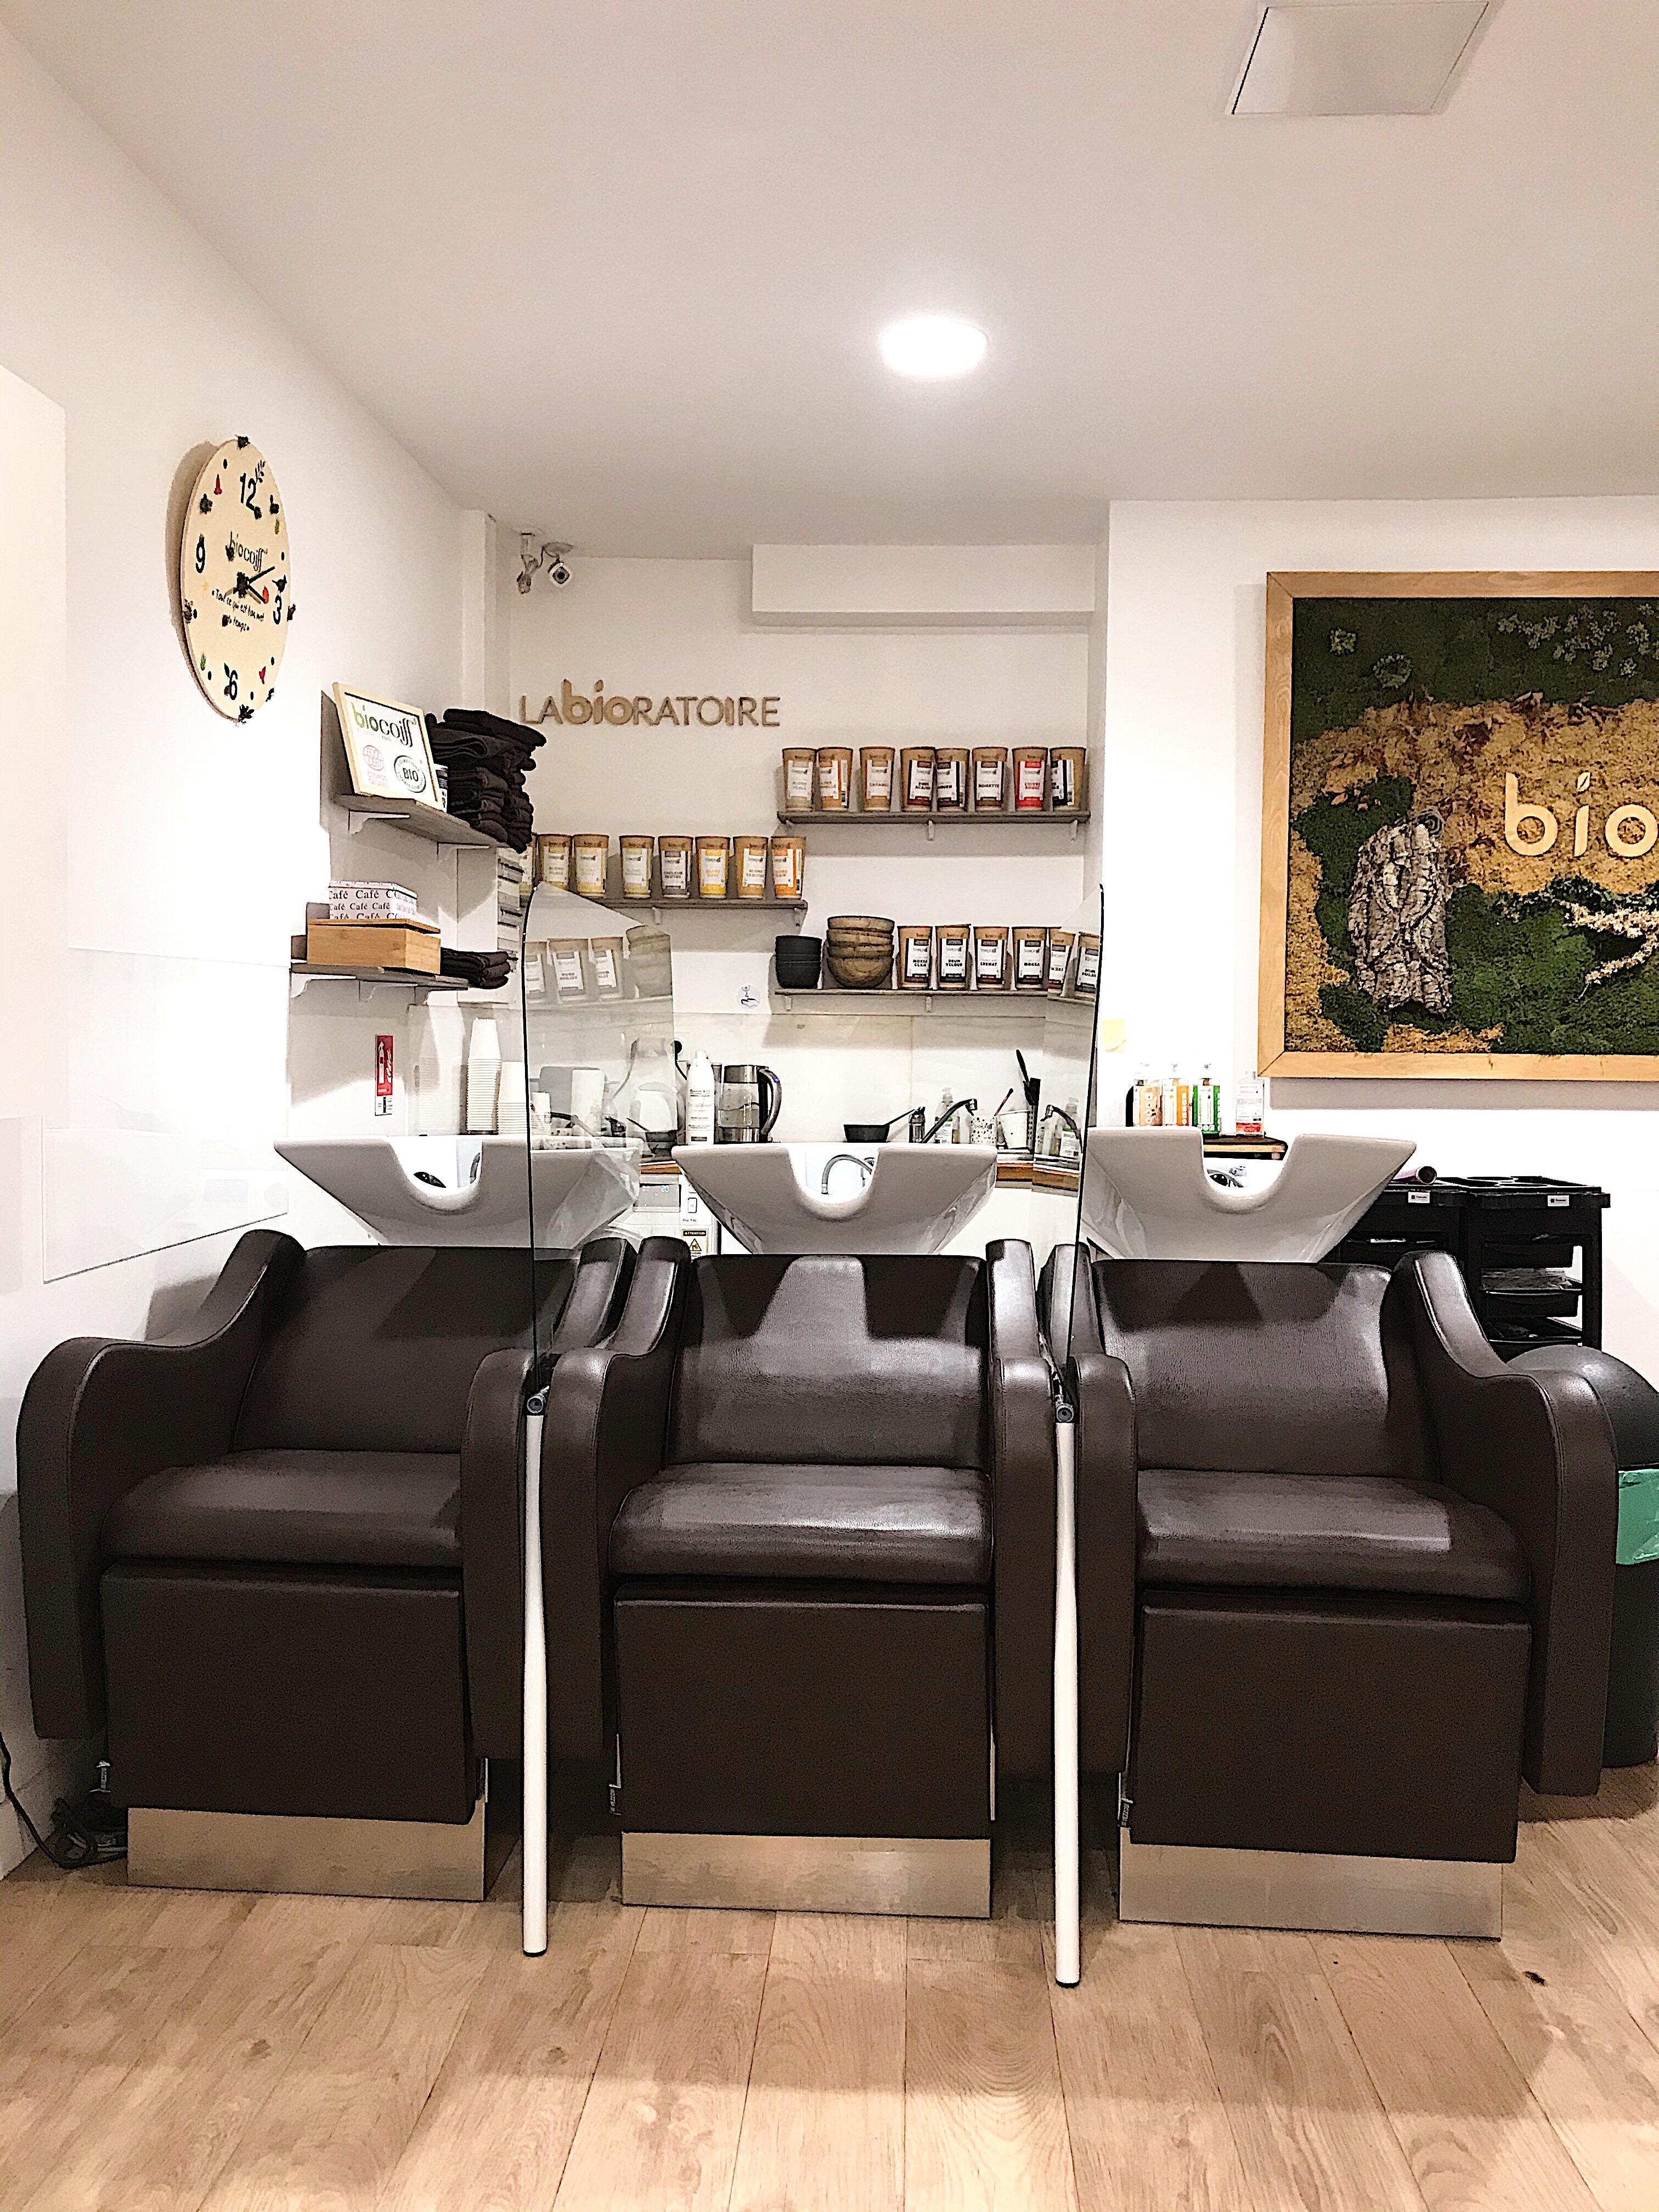 salon-coiffure-bio-coloration-naturelle-vegetale-biocoiff-meches-minerales-